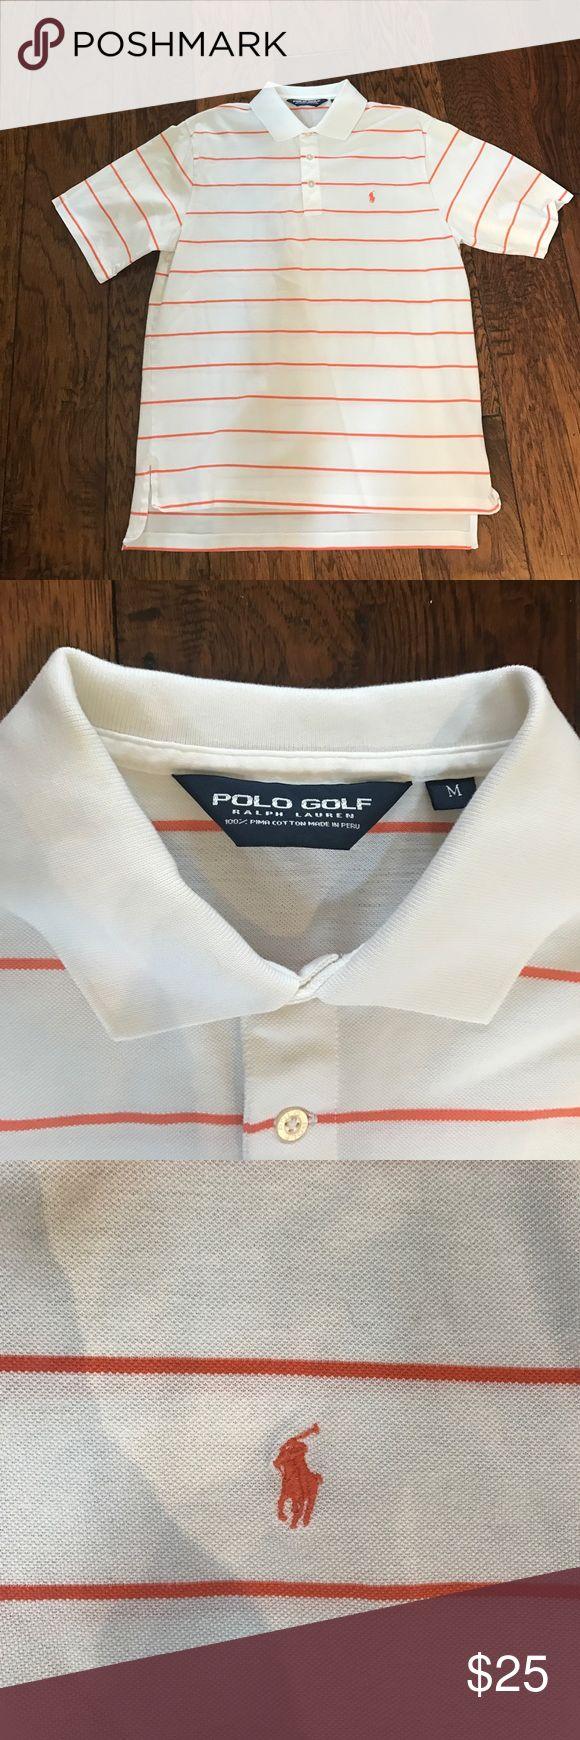 Men's Polo Golf Shirt Excellent condition! Bundle & save! Polo by Ralph Lauren Shirts Polos